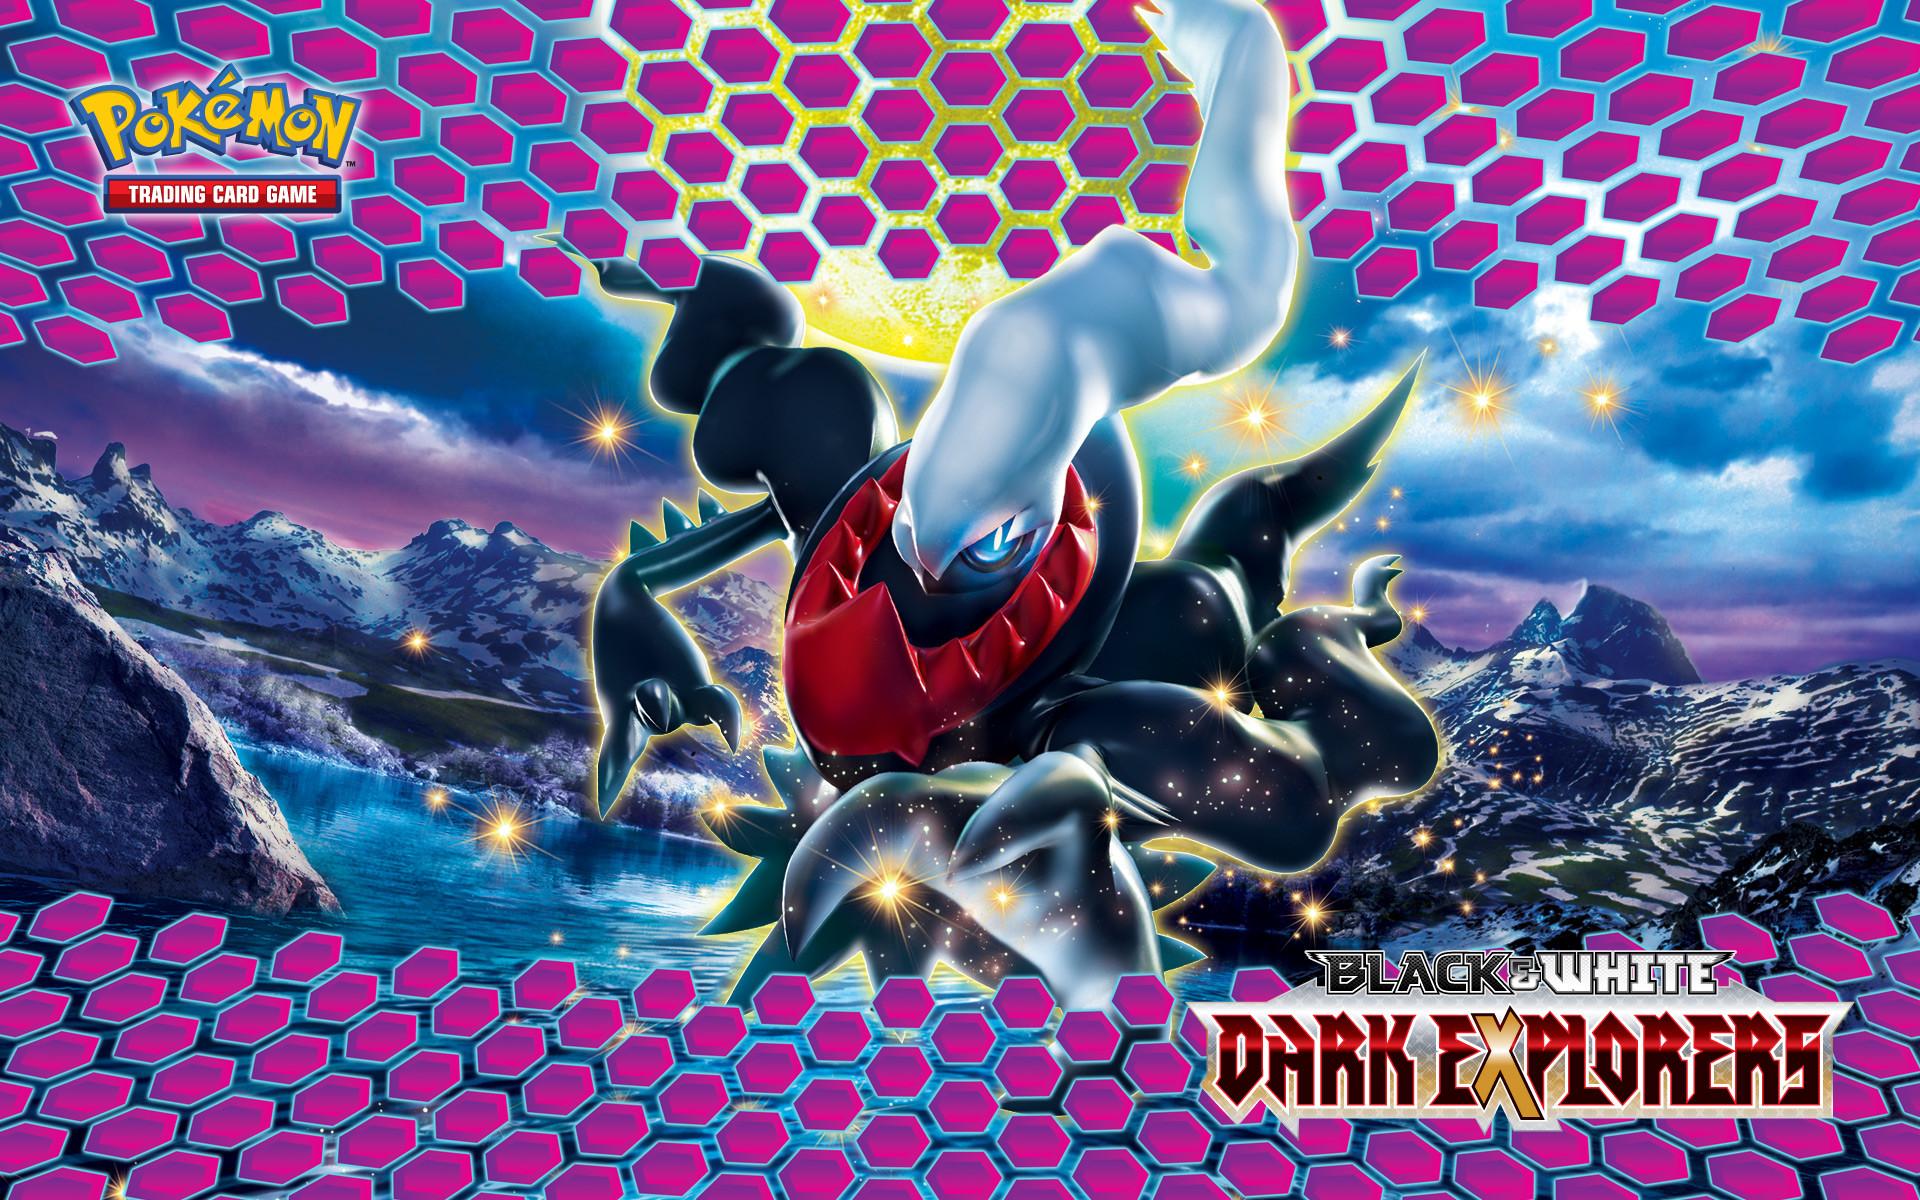 Pokémon TCG: Black & White—Dark Explorers Darkrai Wallpaper. 1024 x 768  1280 x 1024 1440 x 900 …